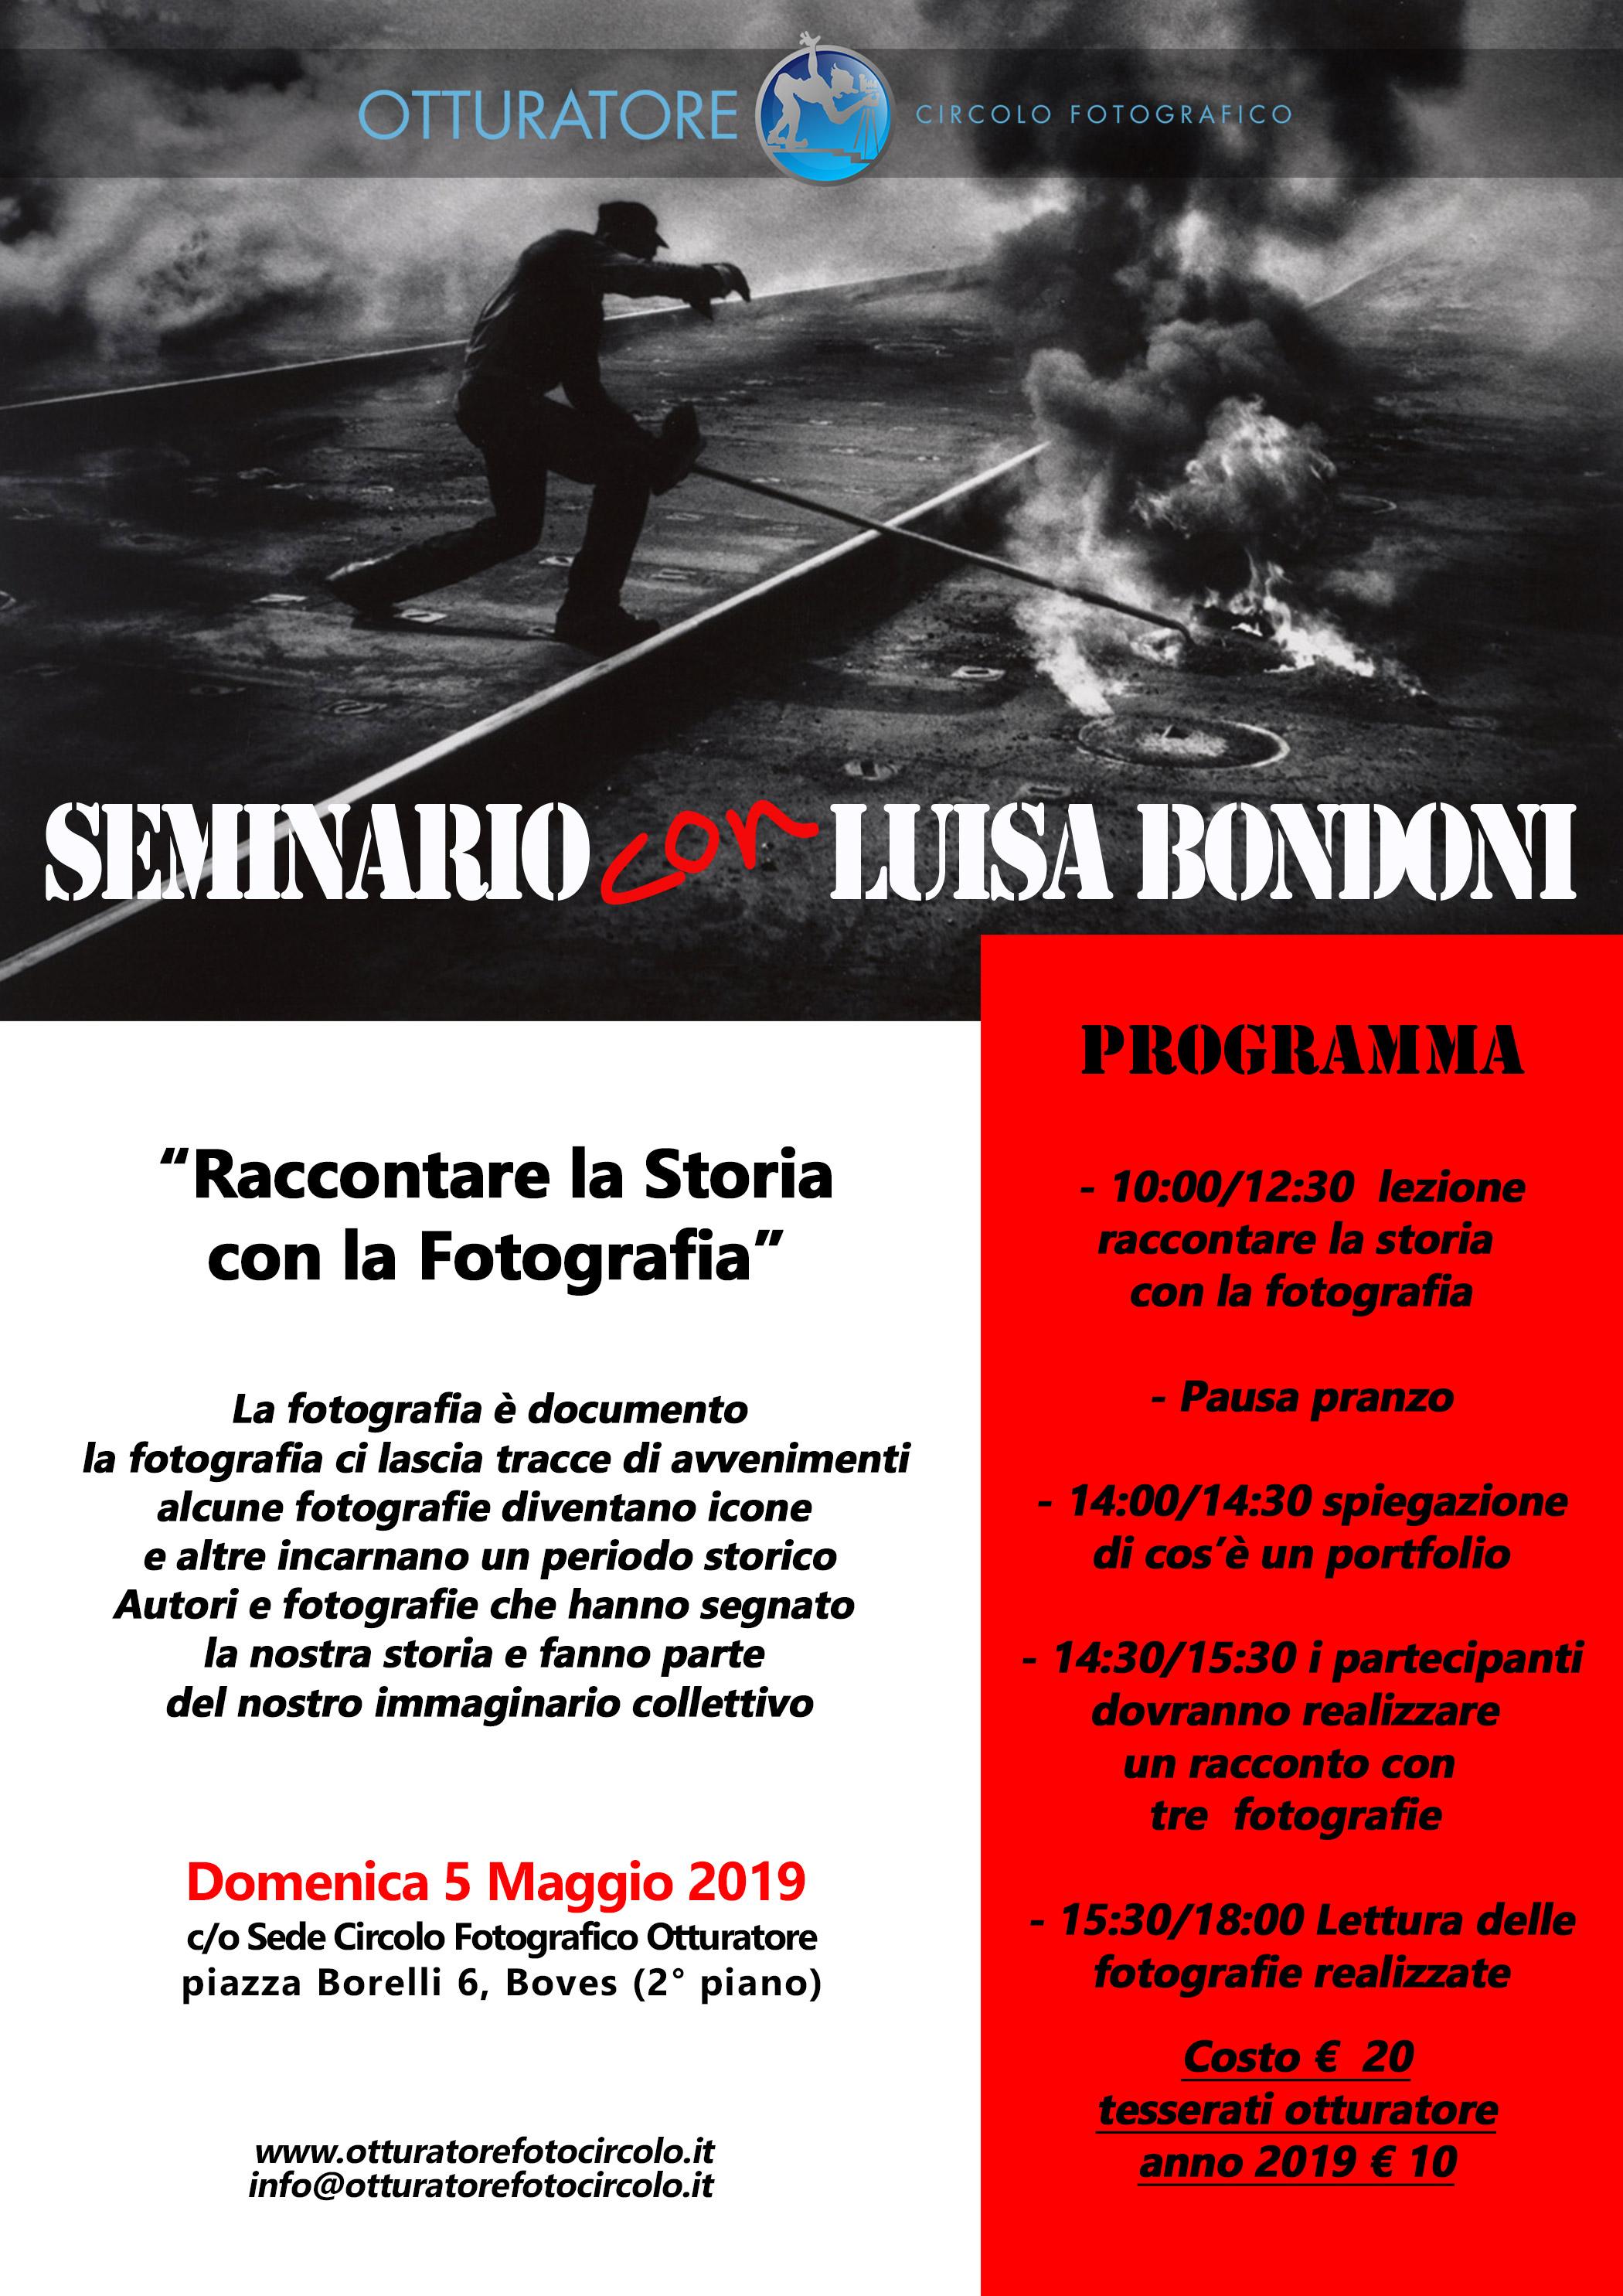 locandina_seminario_bondoni